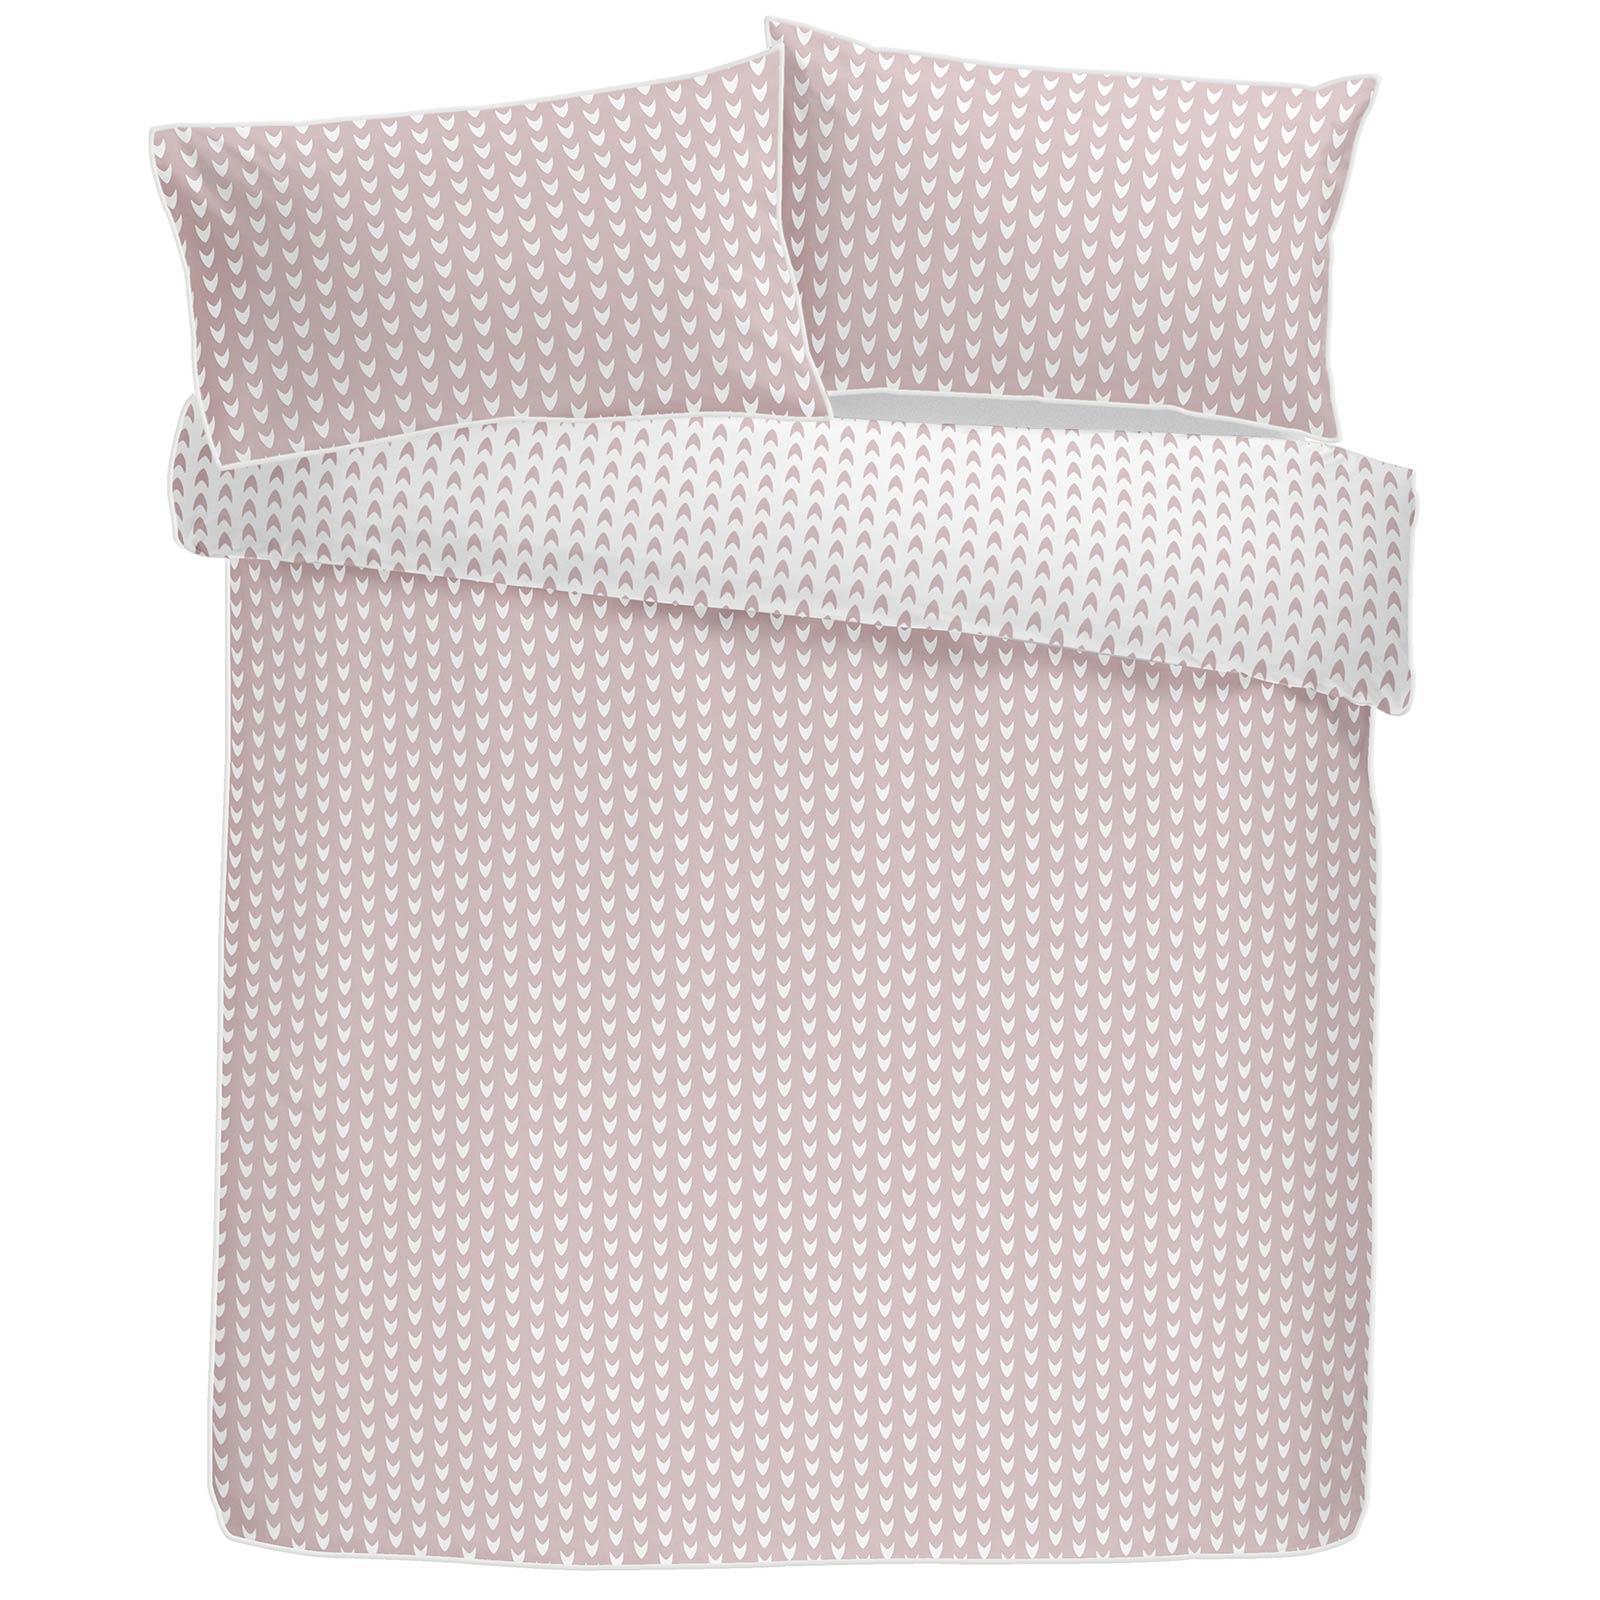 Blush-fundas-nordicas-Rosa-Geometrico-100-Algodon-Edredon-Reversible-conjuntos-de-cama miniatura 13